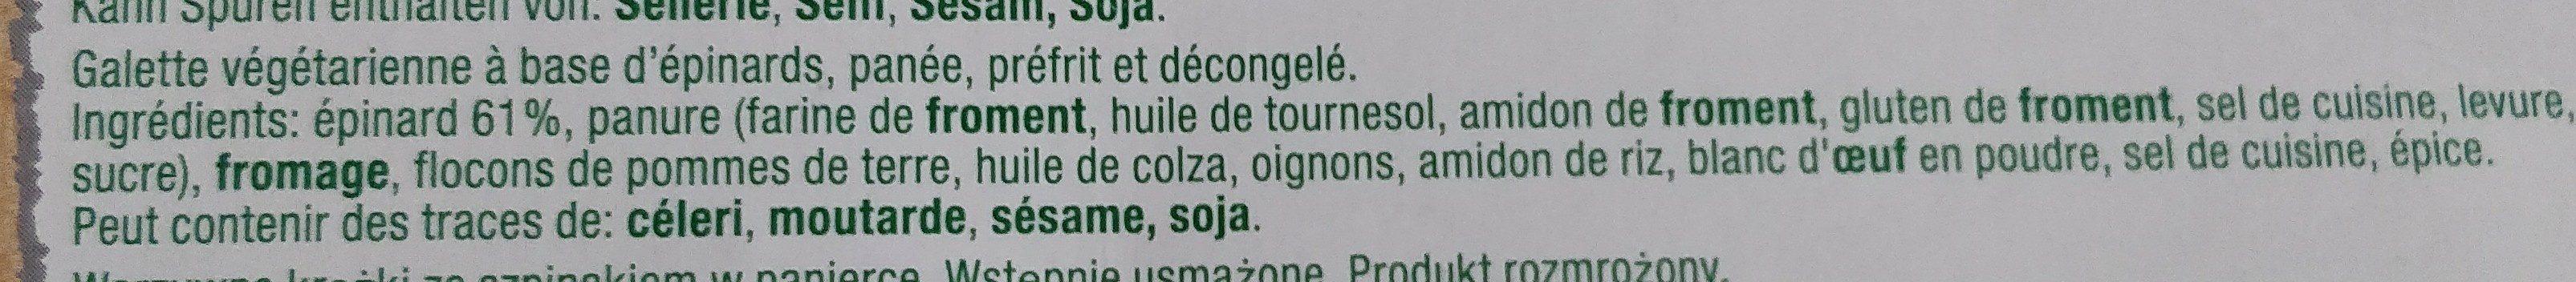 Hilcona Veggie Gemüse medaillons Spinat - Ingrédients